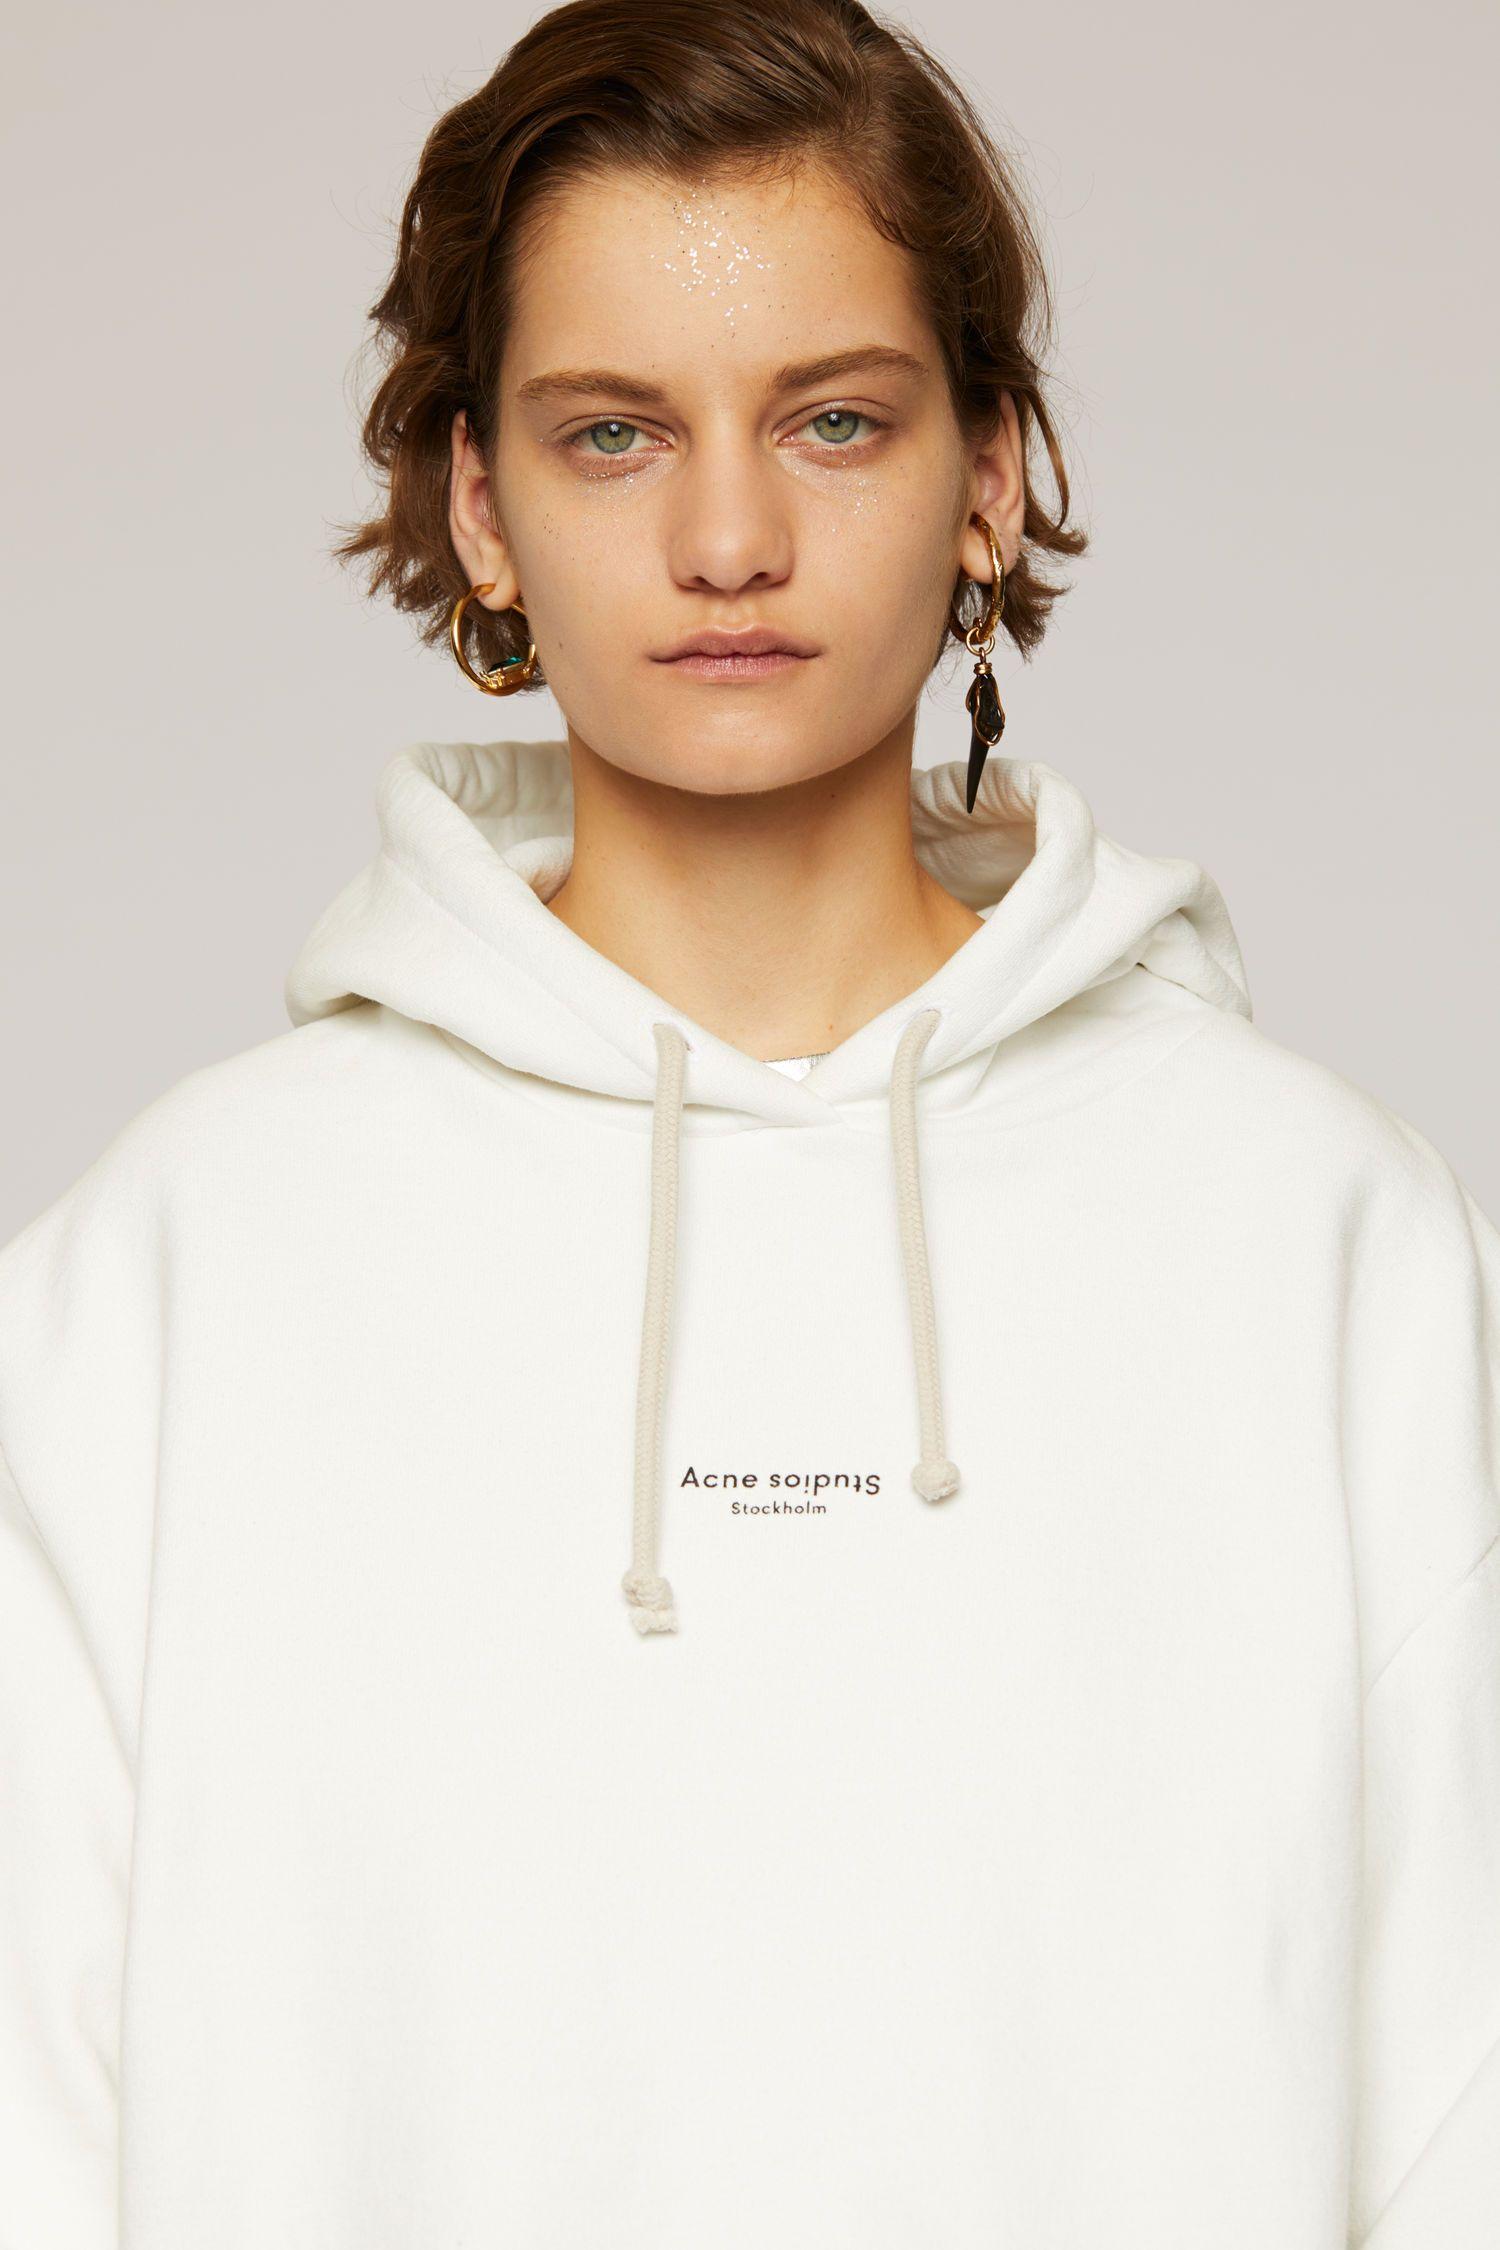 Reverse Logo Hooded Sweatshirt Optic White Hooded Sweatshirts Sweatshirts White Hooded Sweatshirt [ 2250 x 1500 Pixel ]